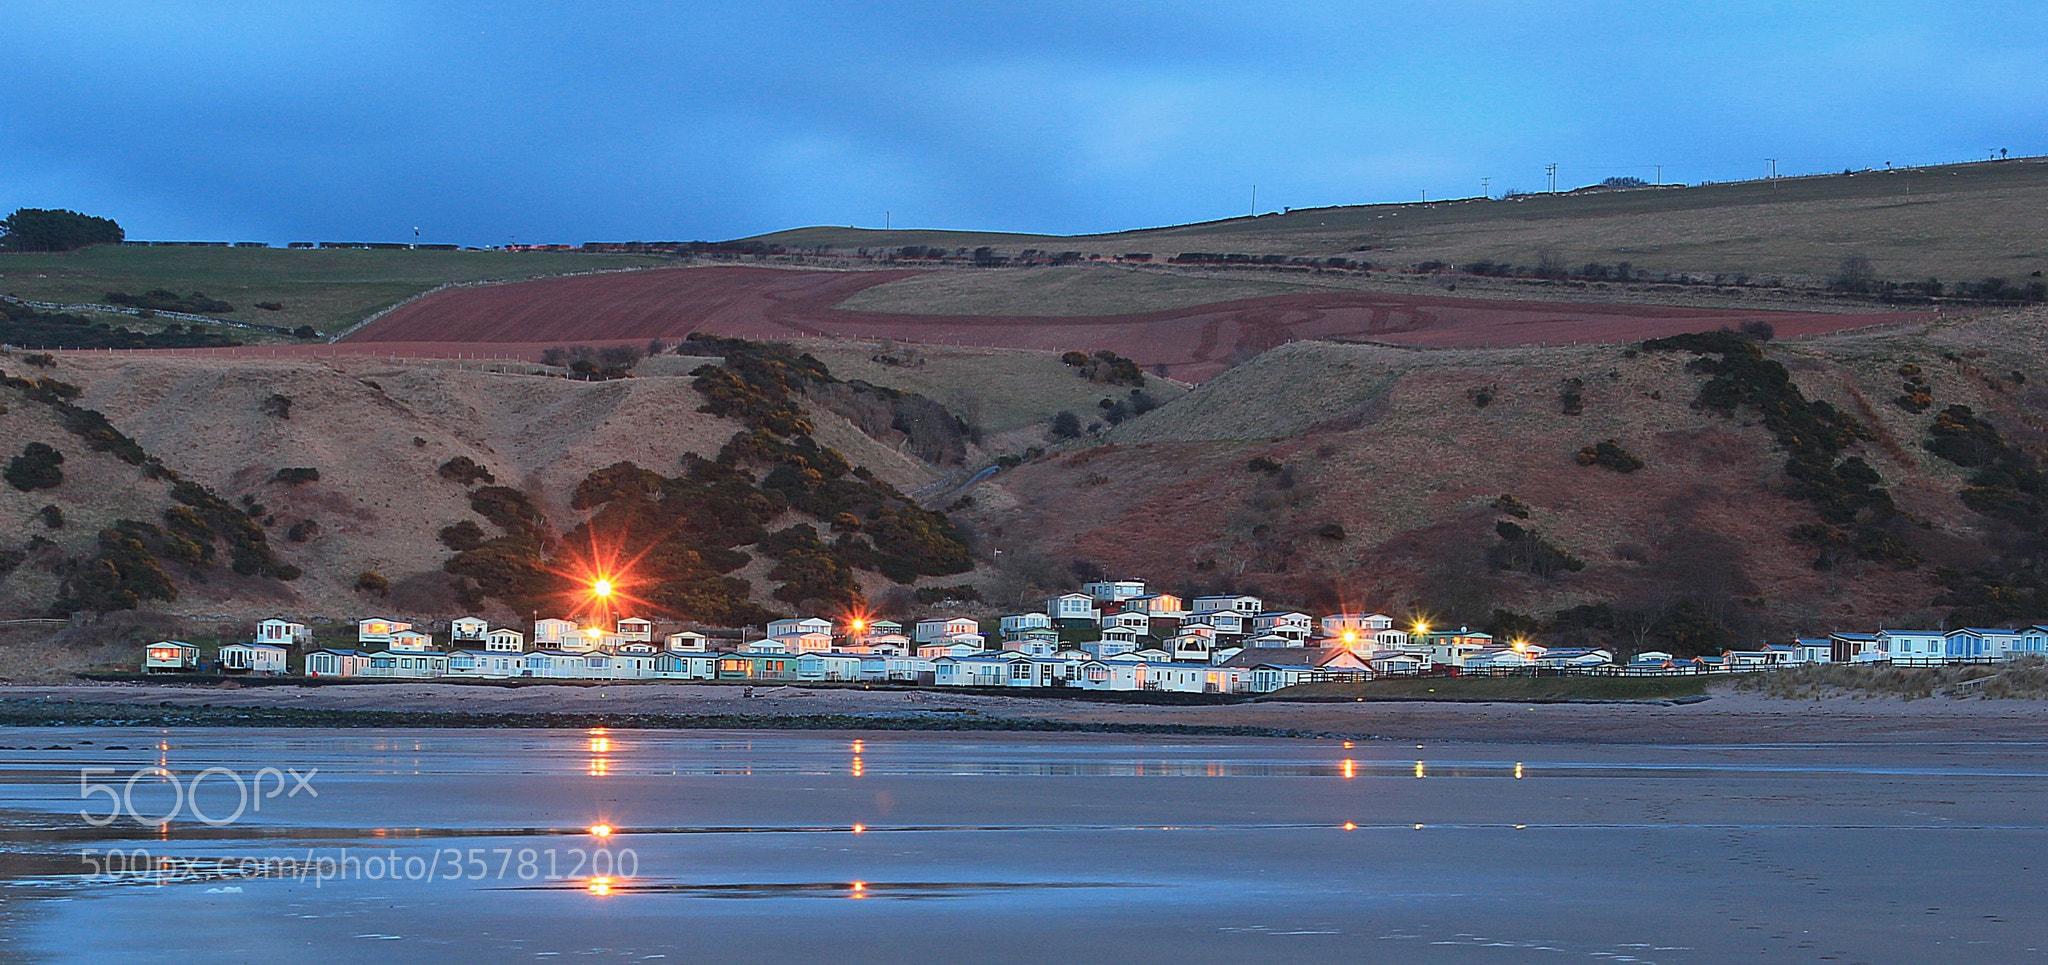 Photograph Pease bay twilight by David Nichol on 500px